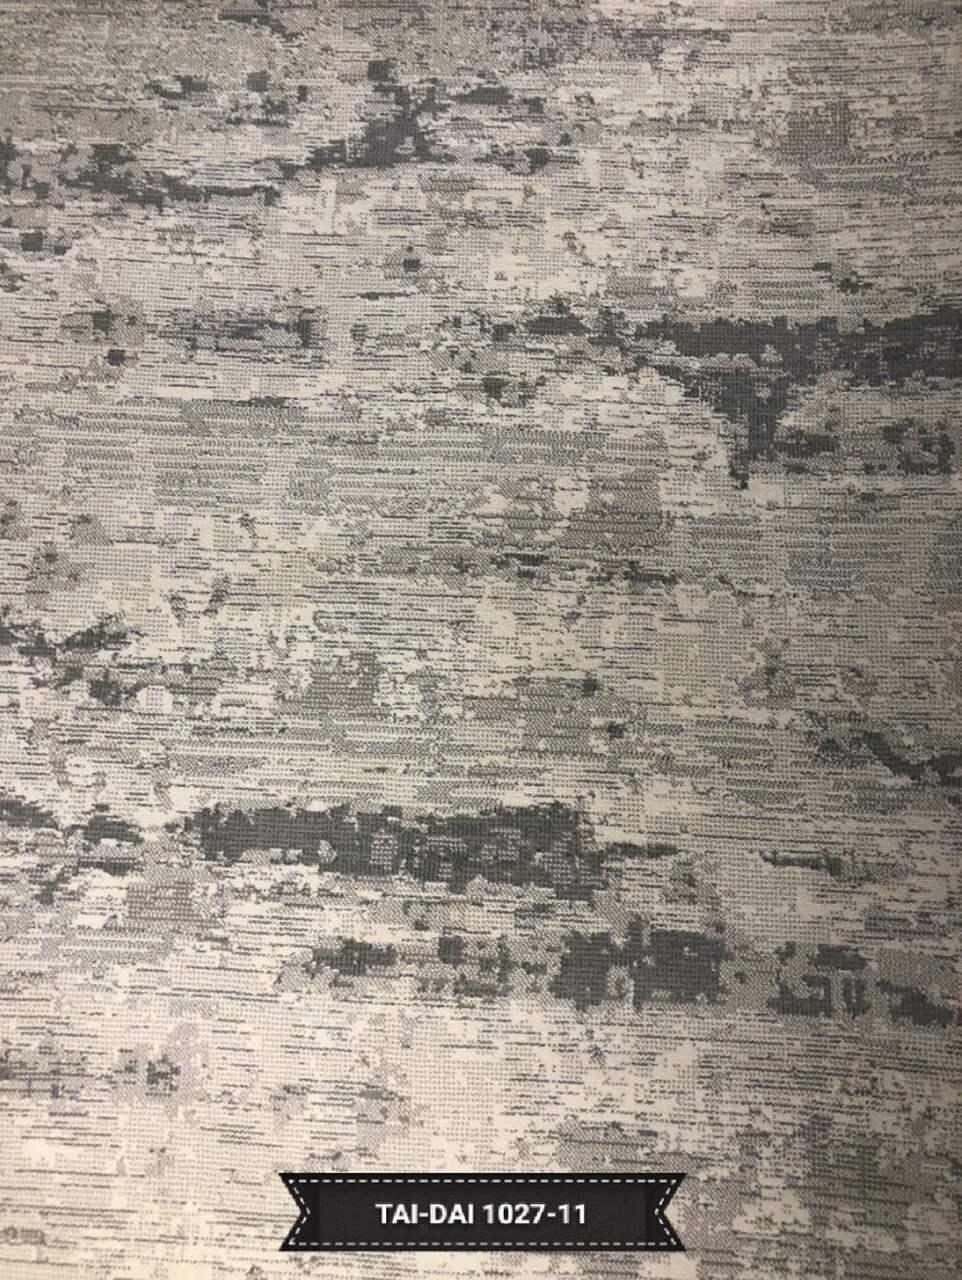 Tapete Tai Dai ref. 1027-11- 250 x 350 cm